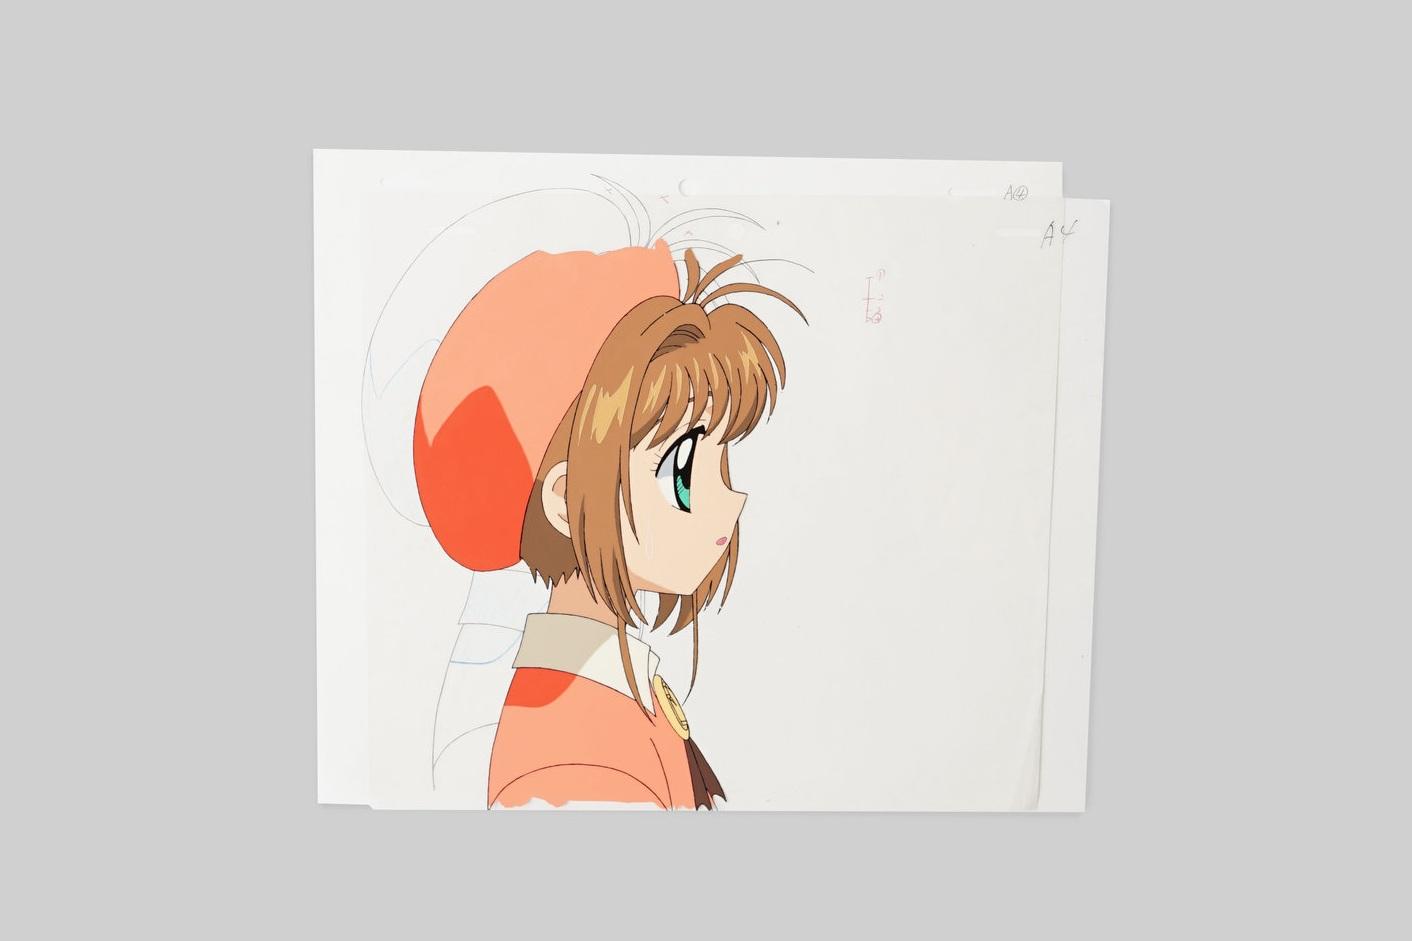 unun_cell-sakura-cardcapter_12.jpg